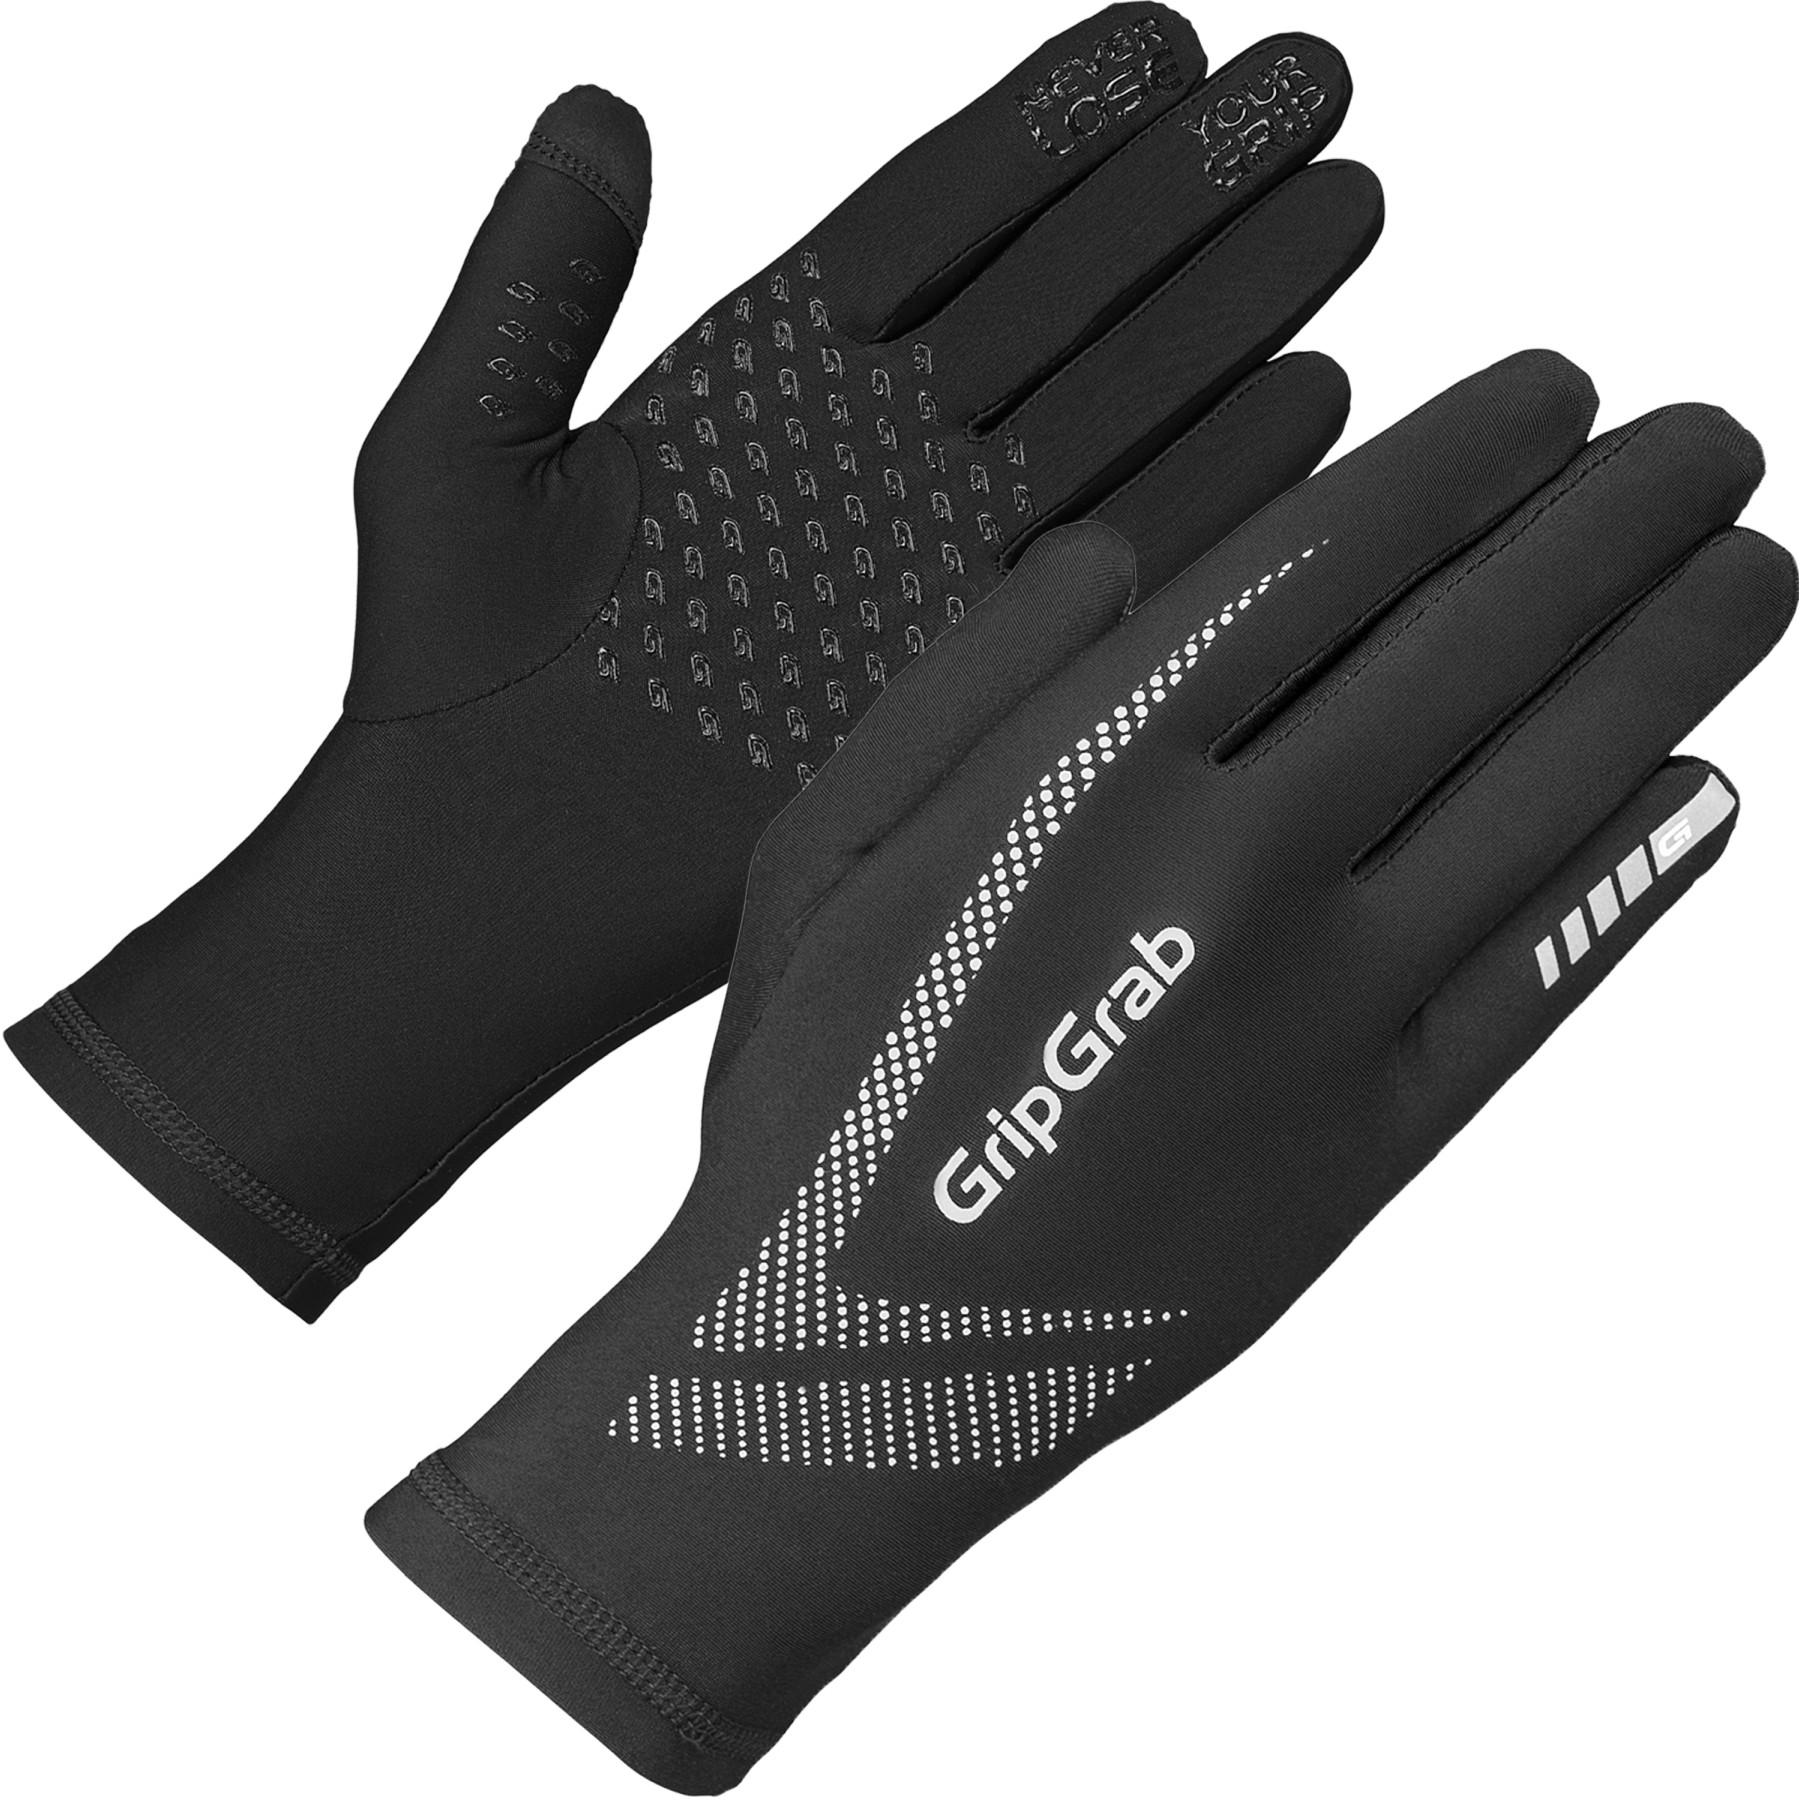 Foto de GripGrab Running UltraLight Touchscreen Guantes de invierno - Black